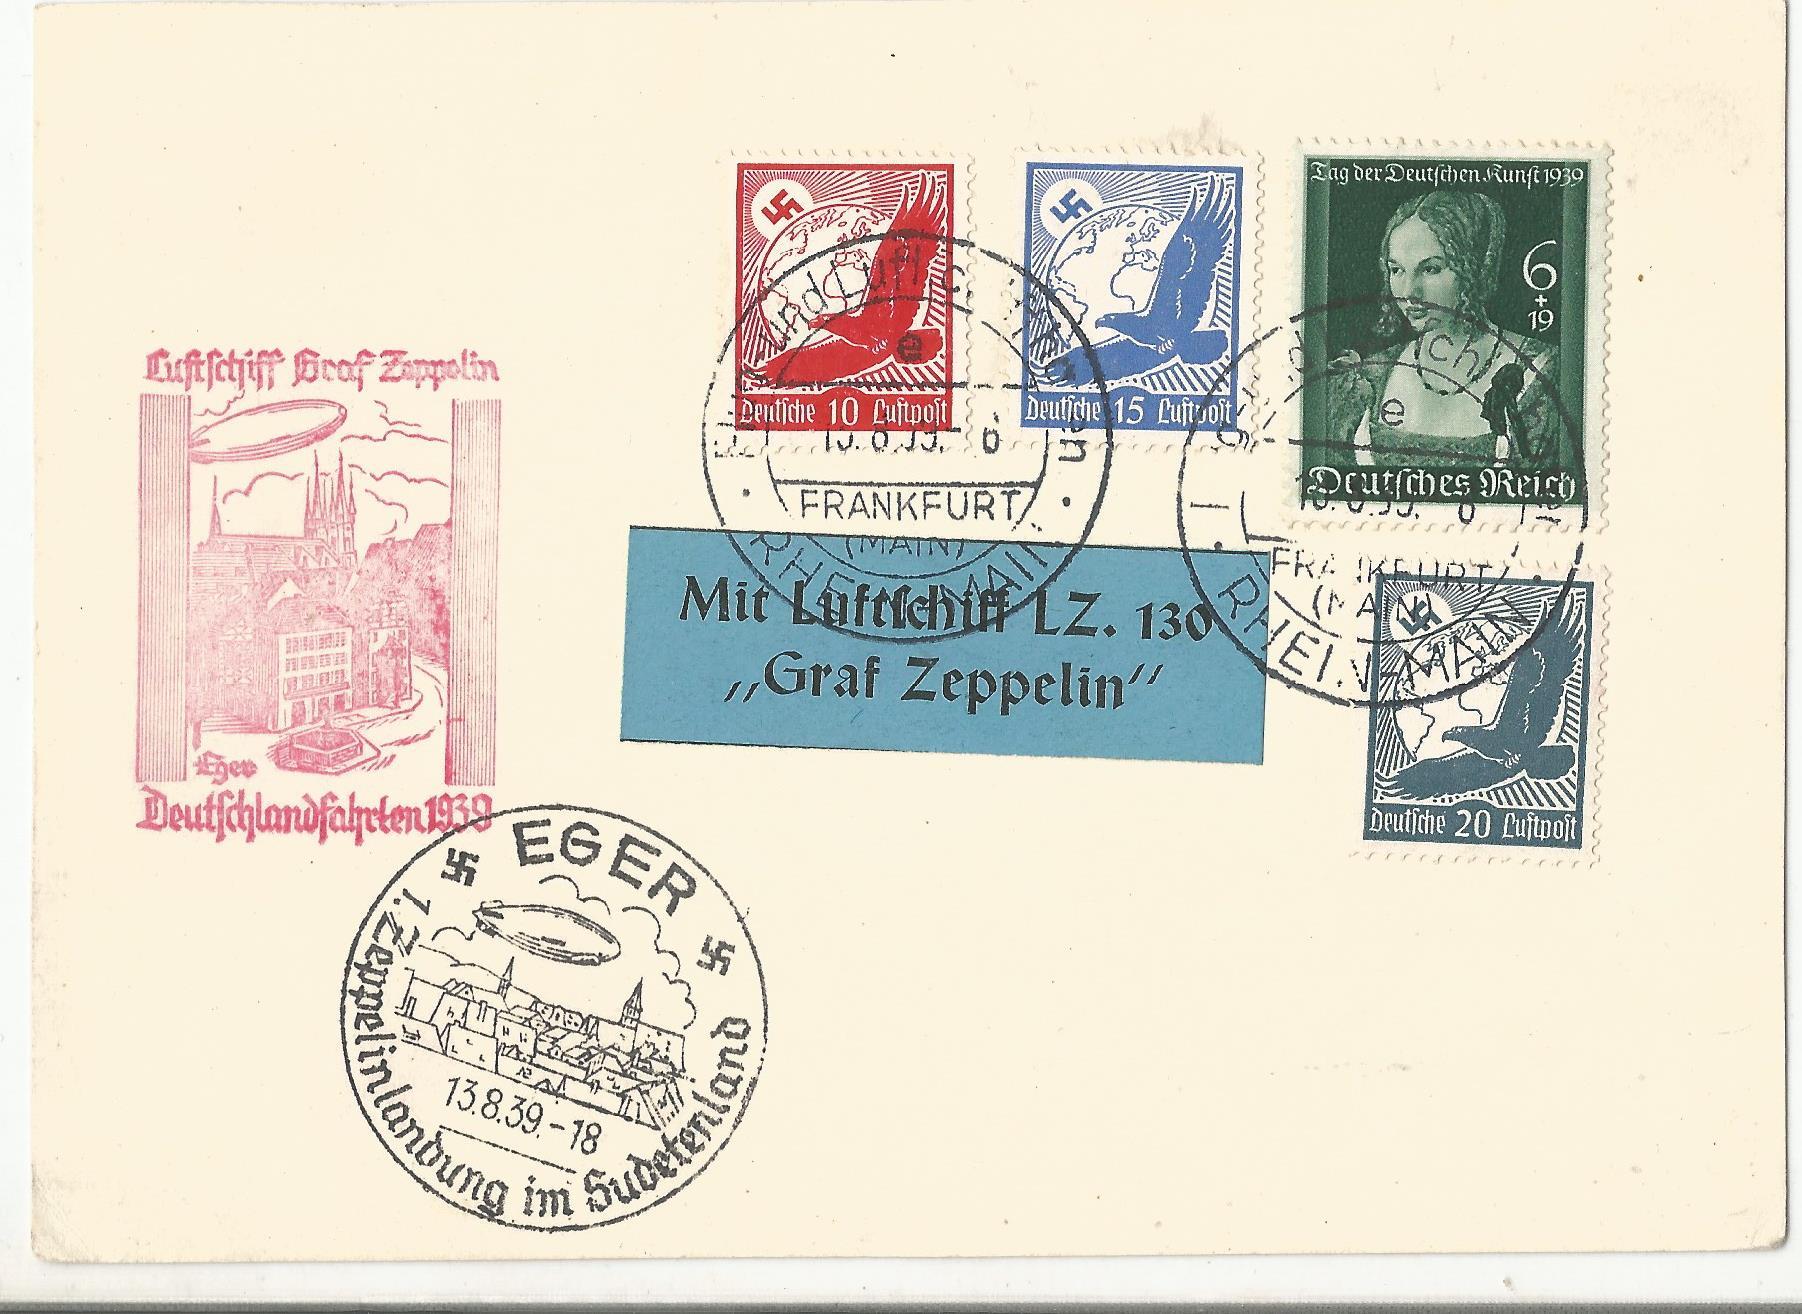 Lot 55 - 1939 LZ130 Graf Zeppelin flown cover Frankfurt postmarks and Eger Czech Republic mark. With LZ130.